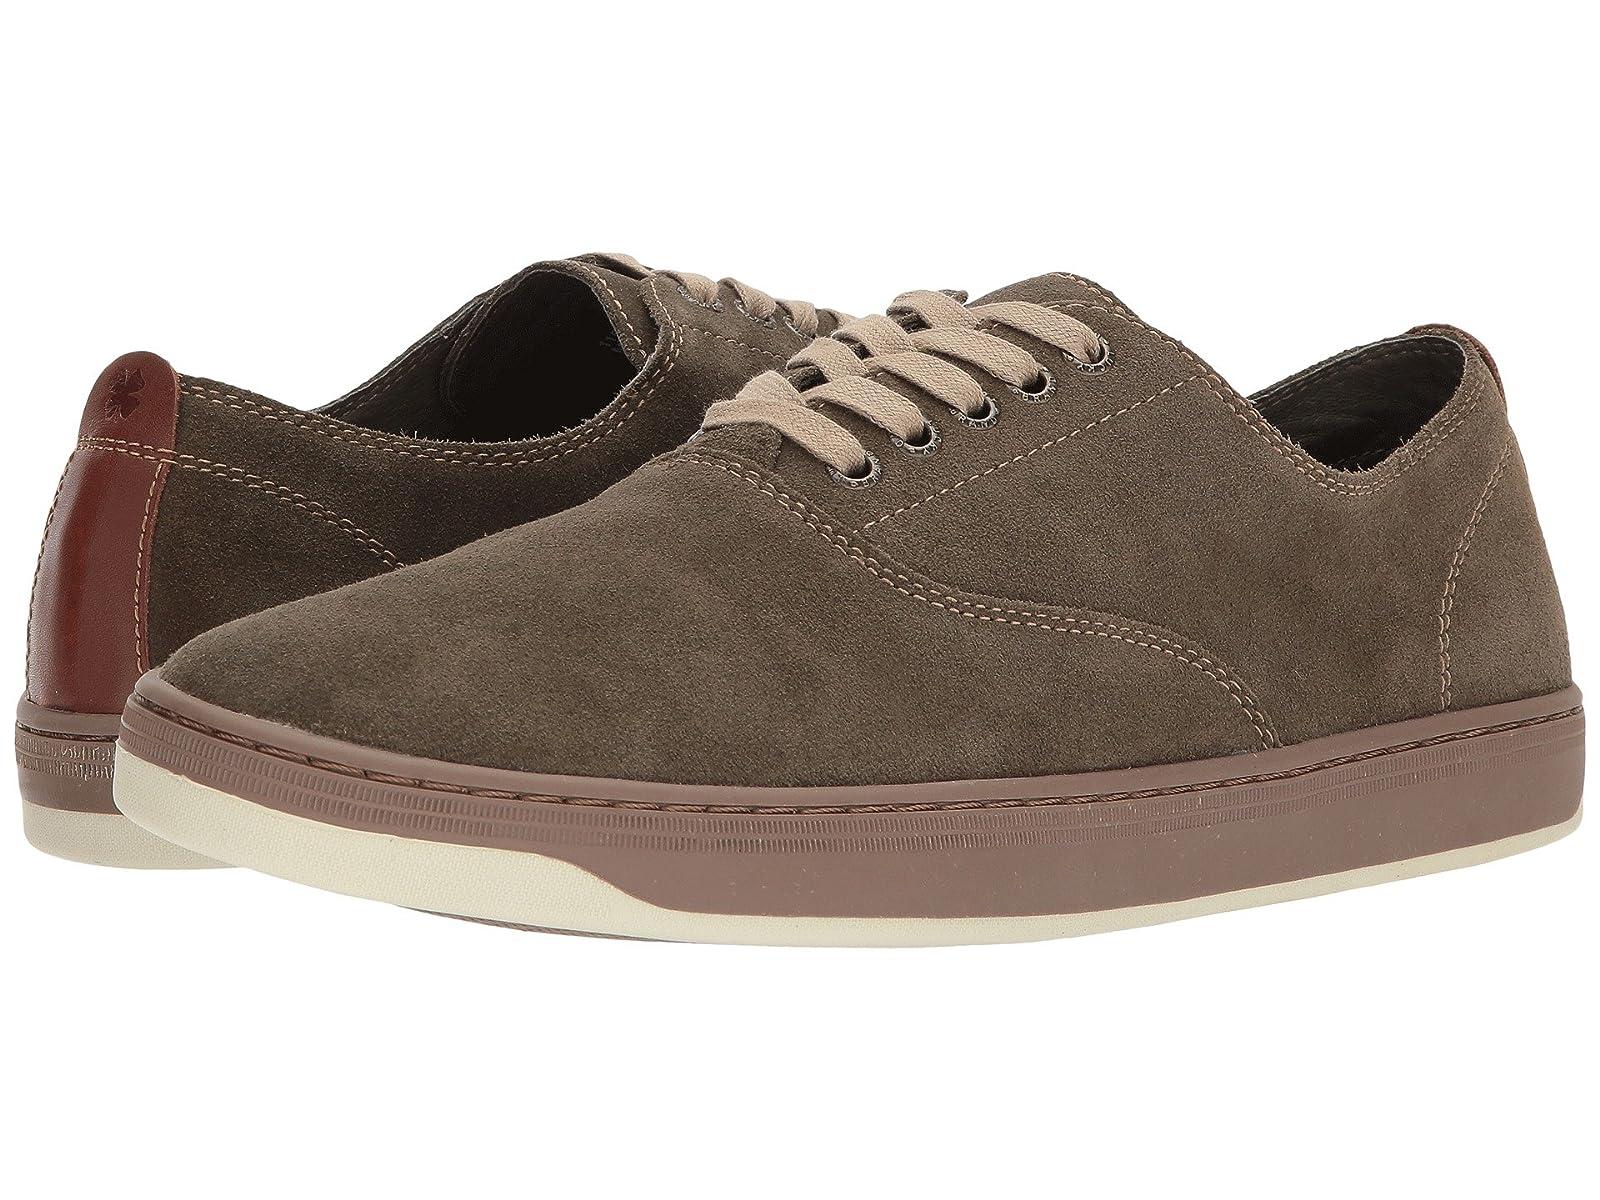 Lucky Brand ParkesCheap and distinctive eye-catching shoes